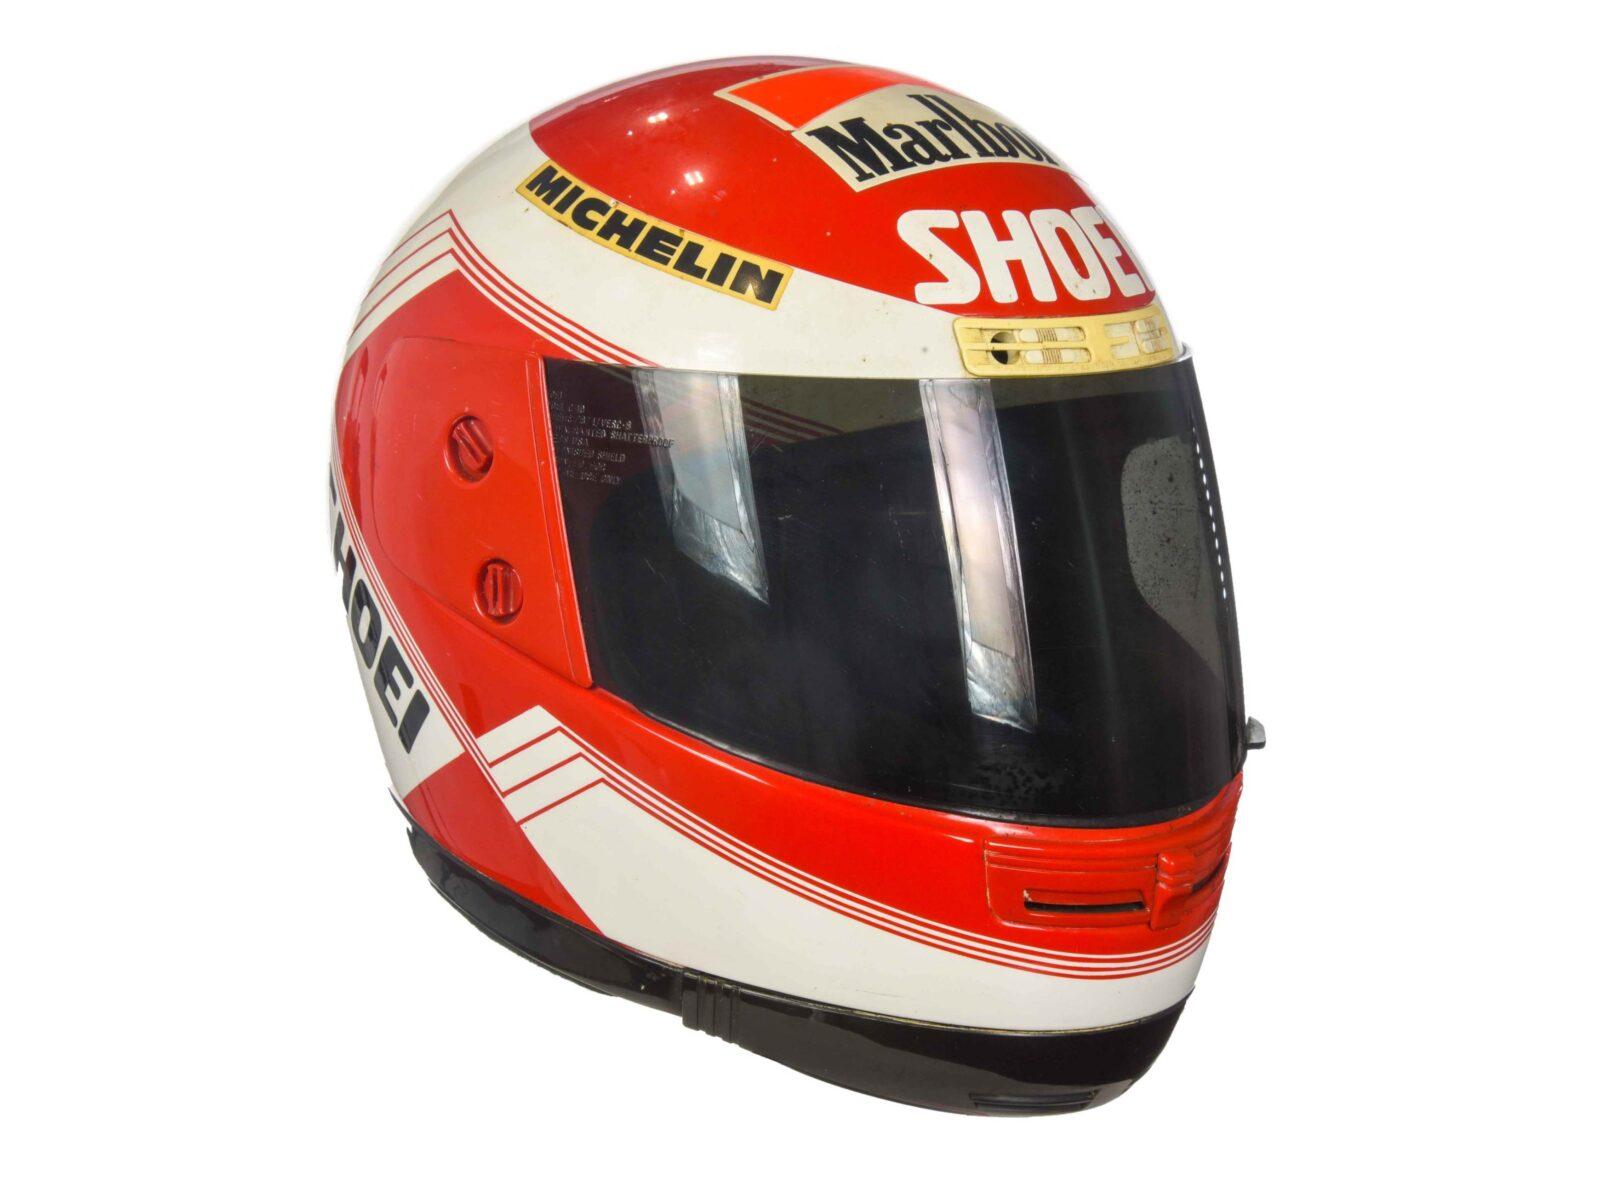 Eddie Lawson Shoei Helmet